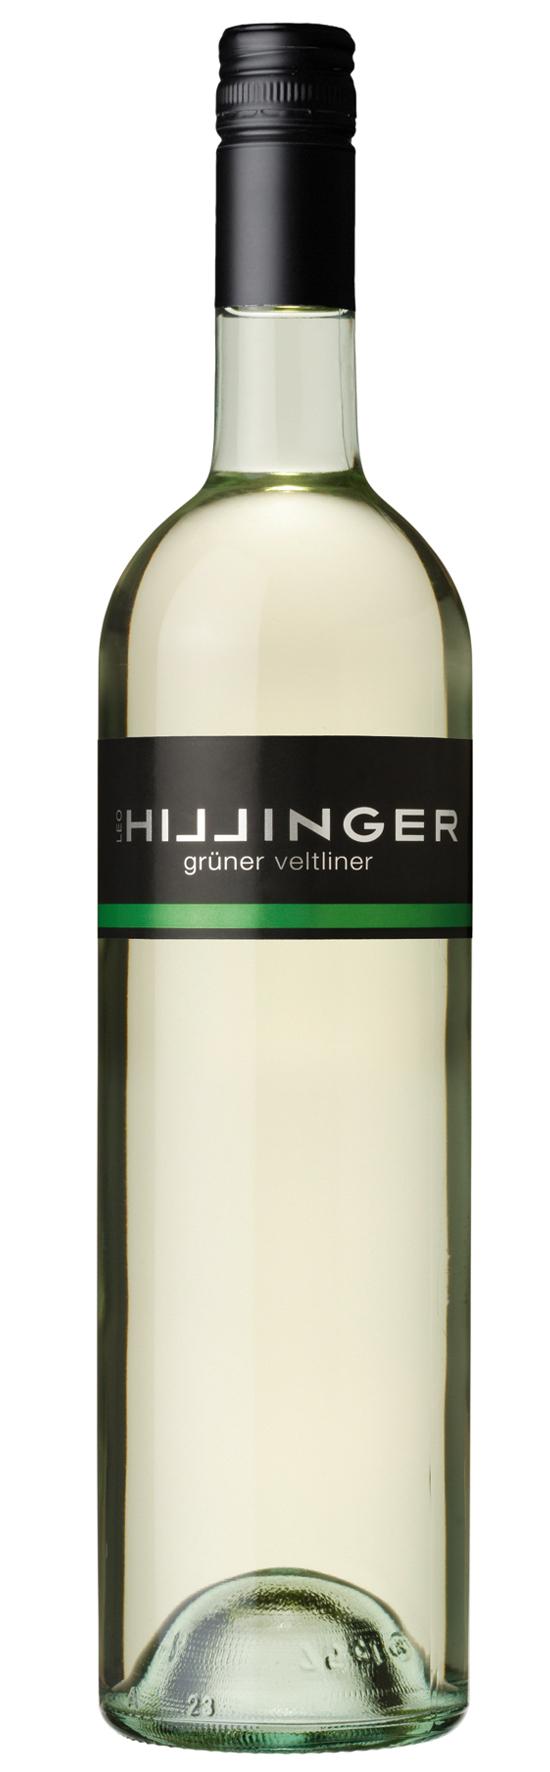 Grüner Veltliner Leo Hillinger 2015